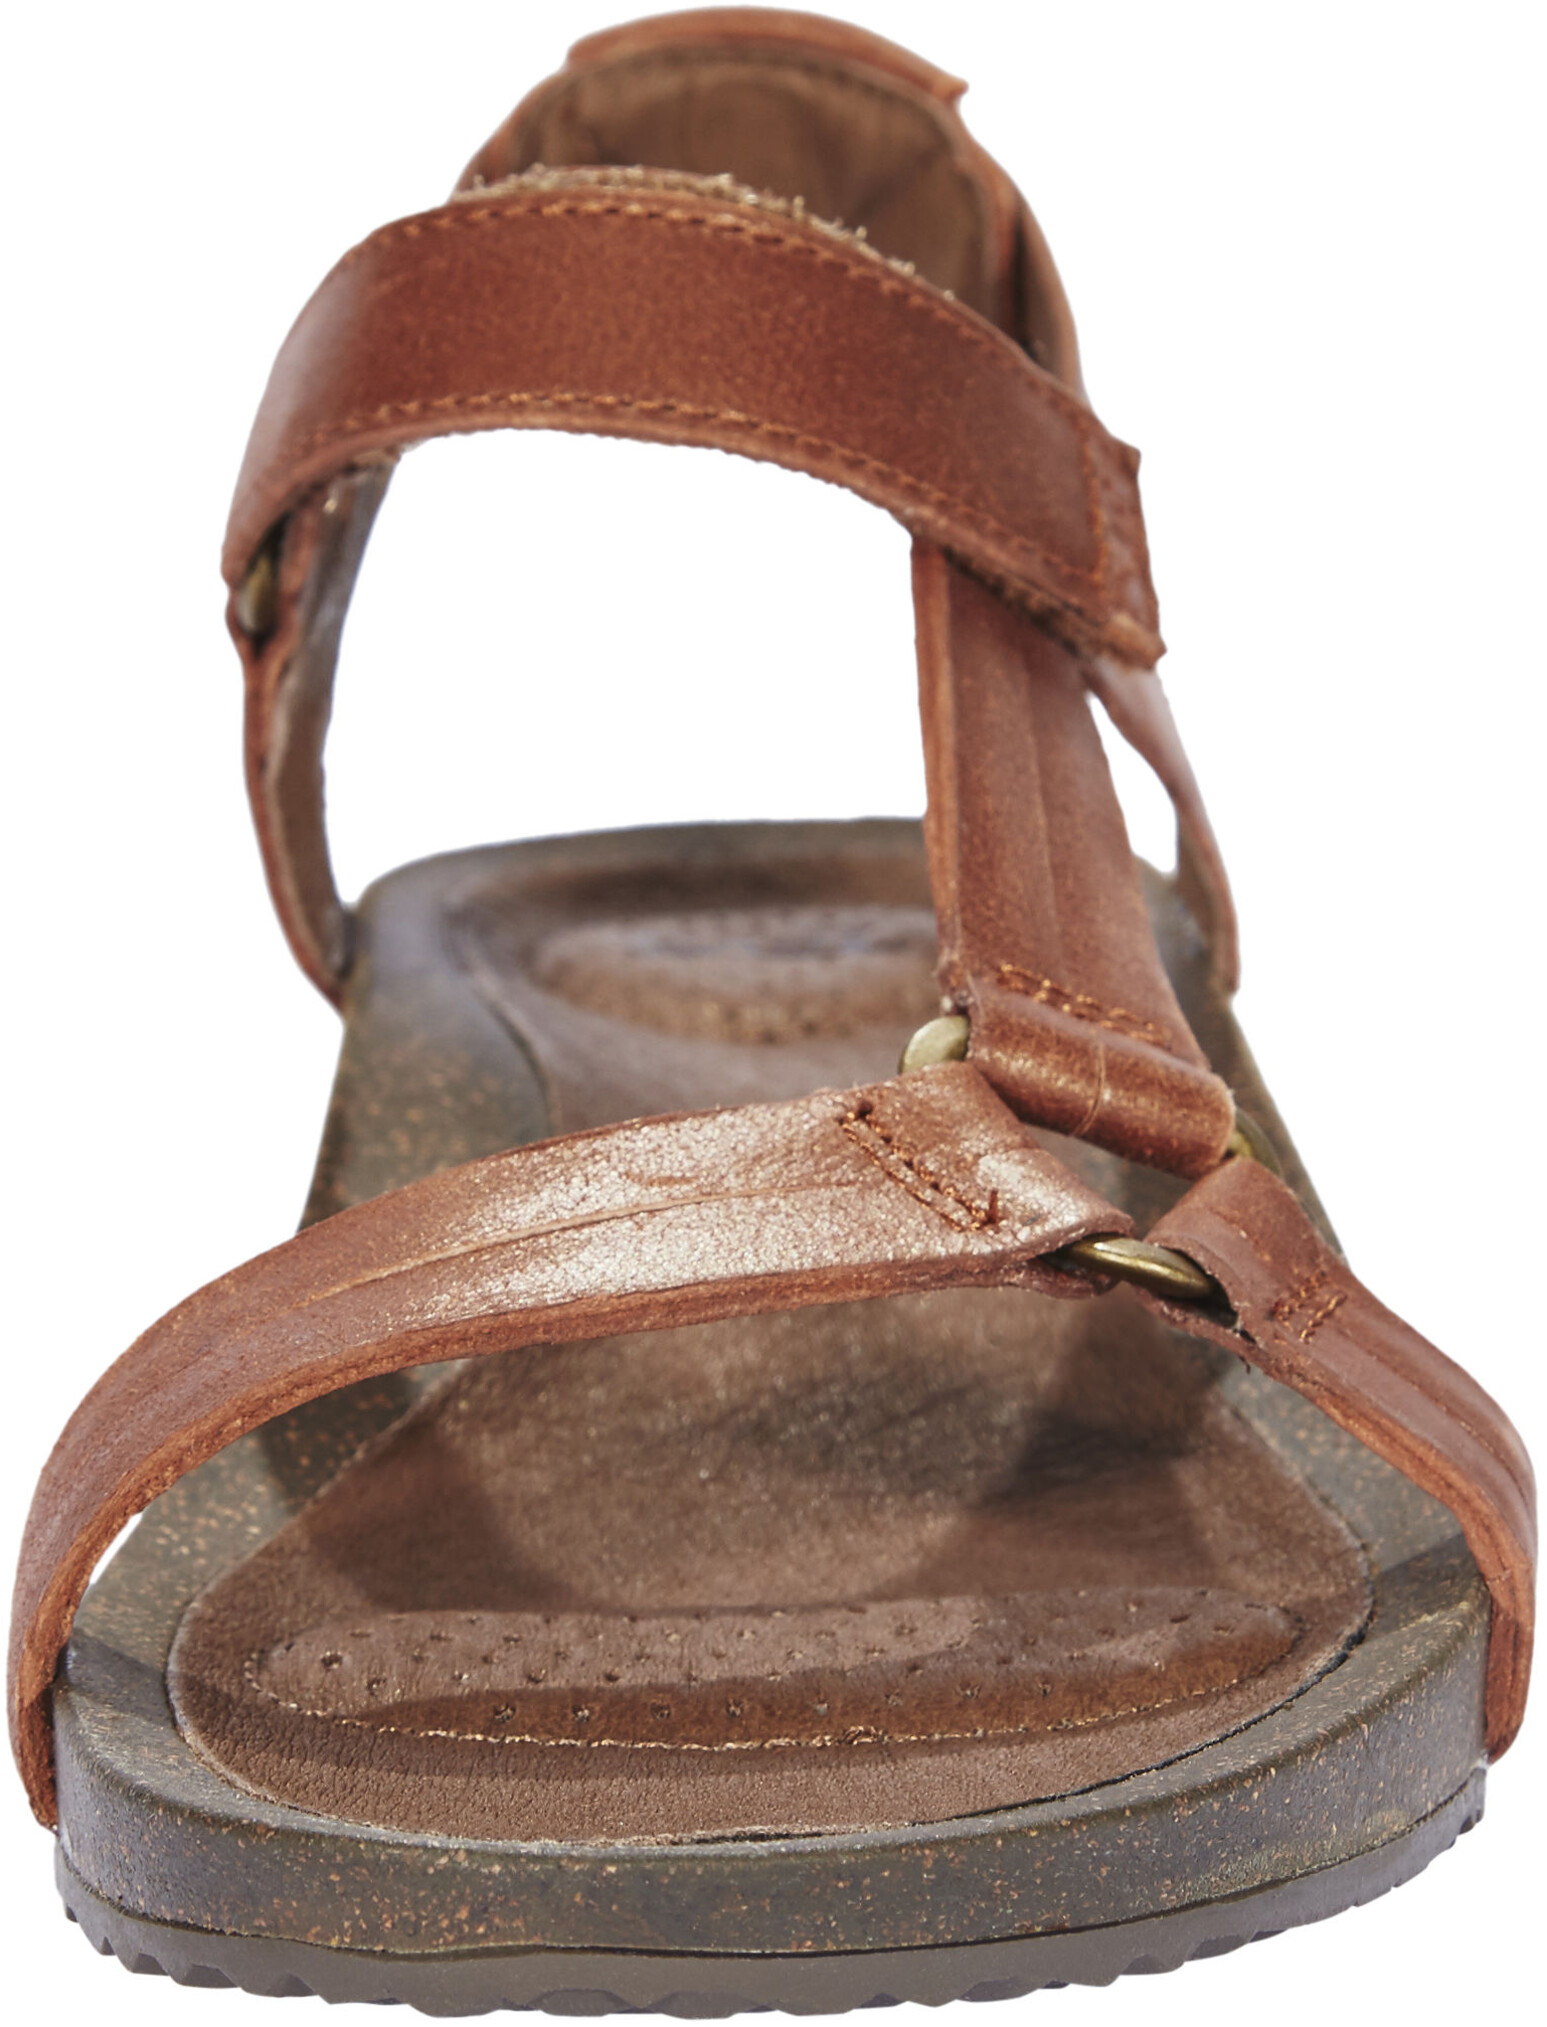 9e2837bb048a Teva Ysidro Sandals.Teva Ysidro Universal Metallic Sandals Women ...